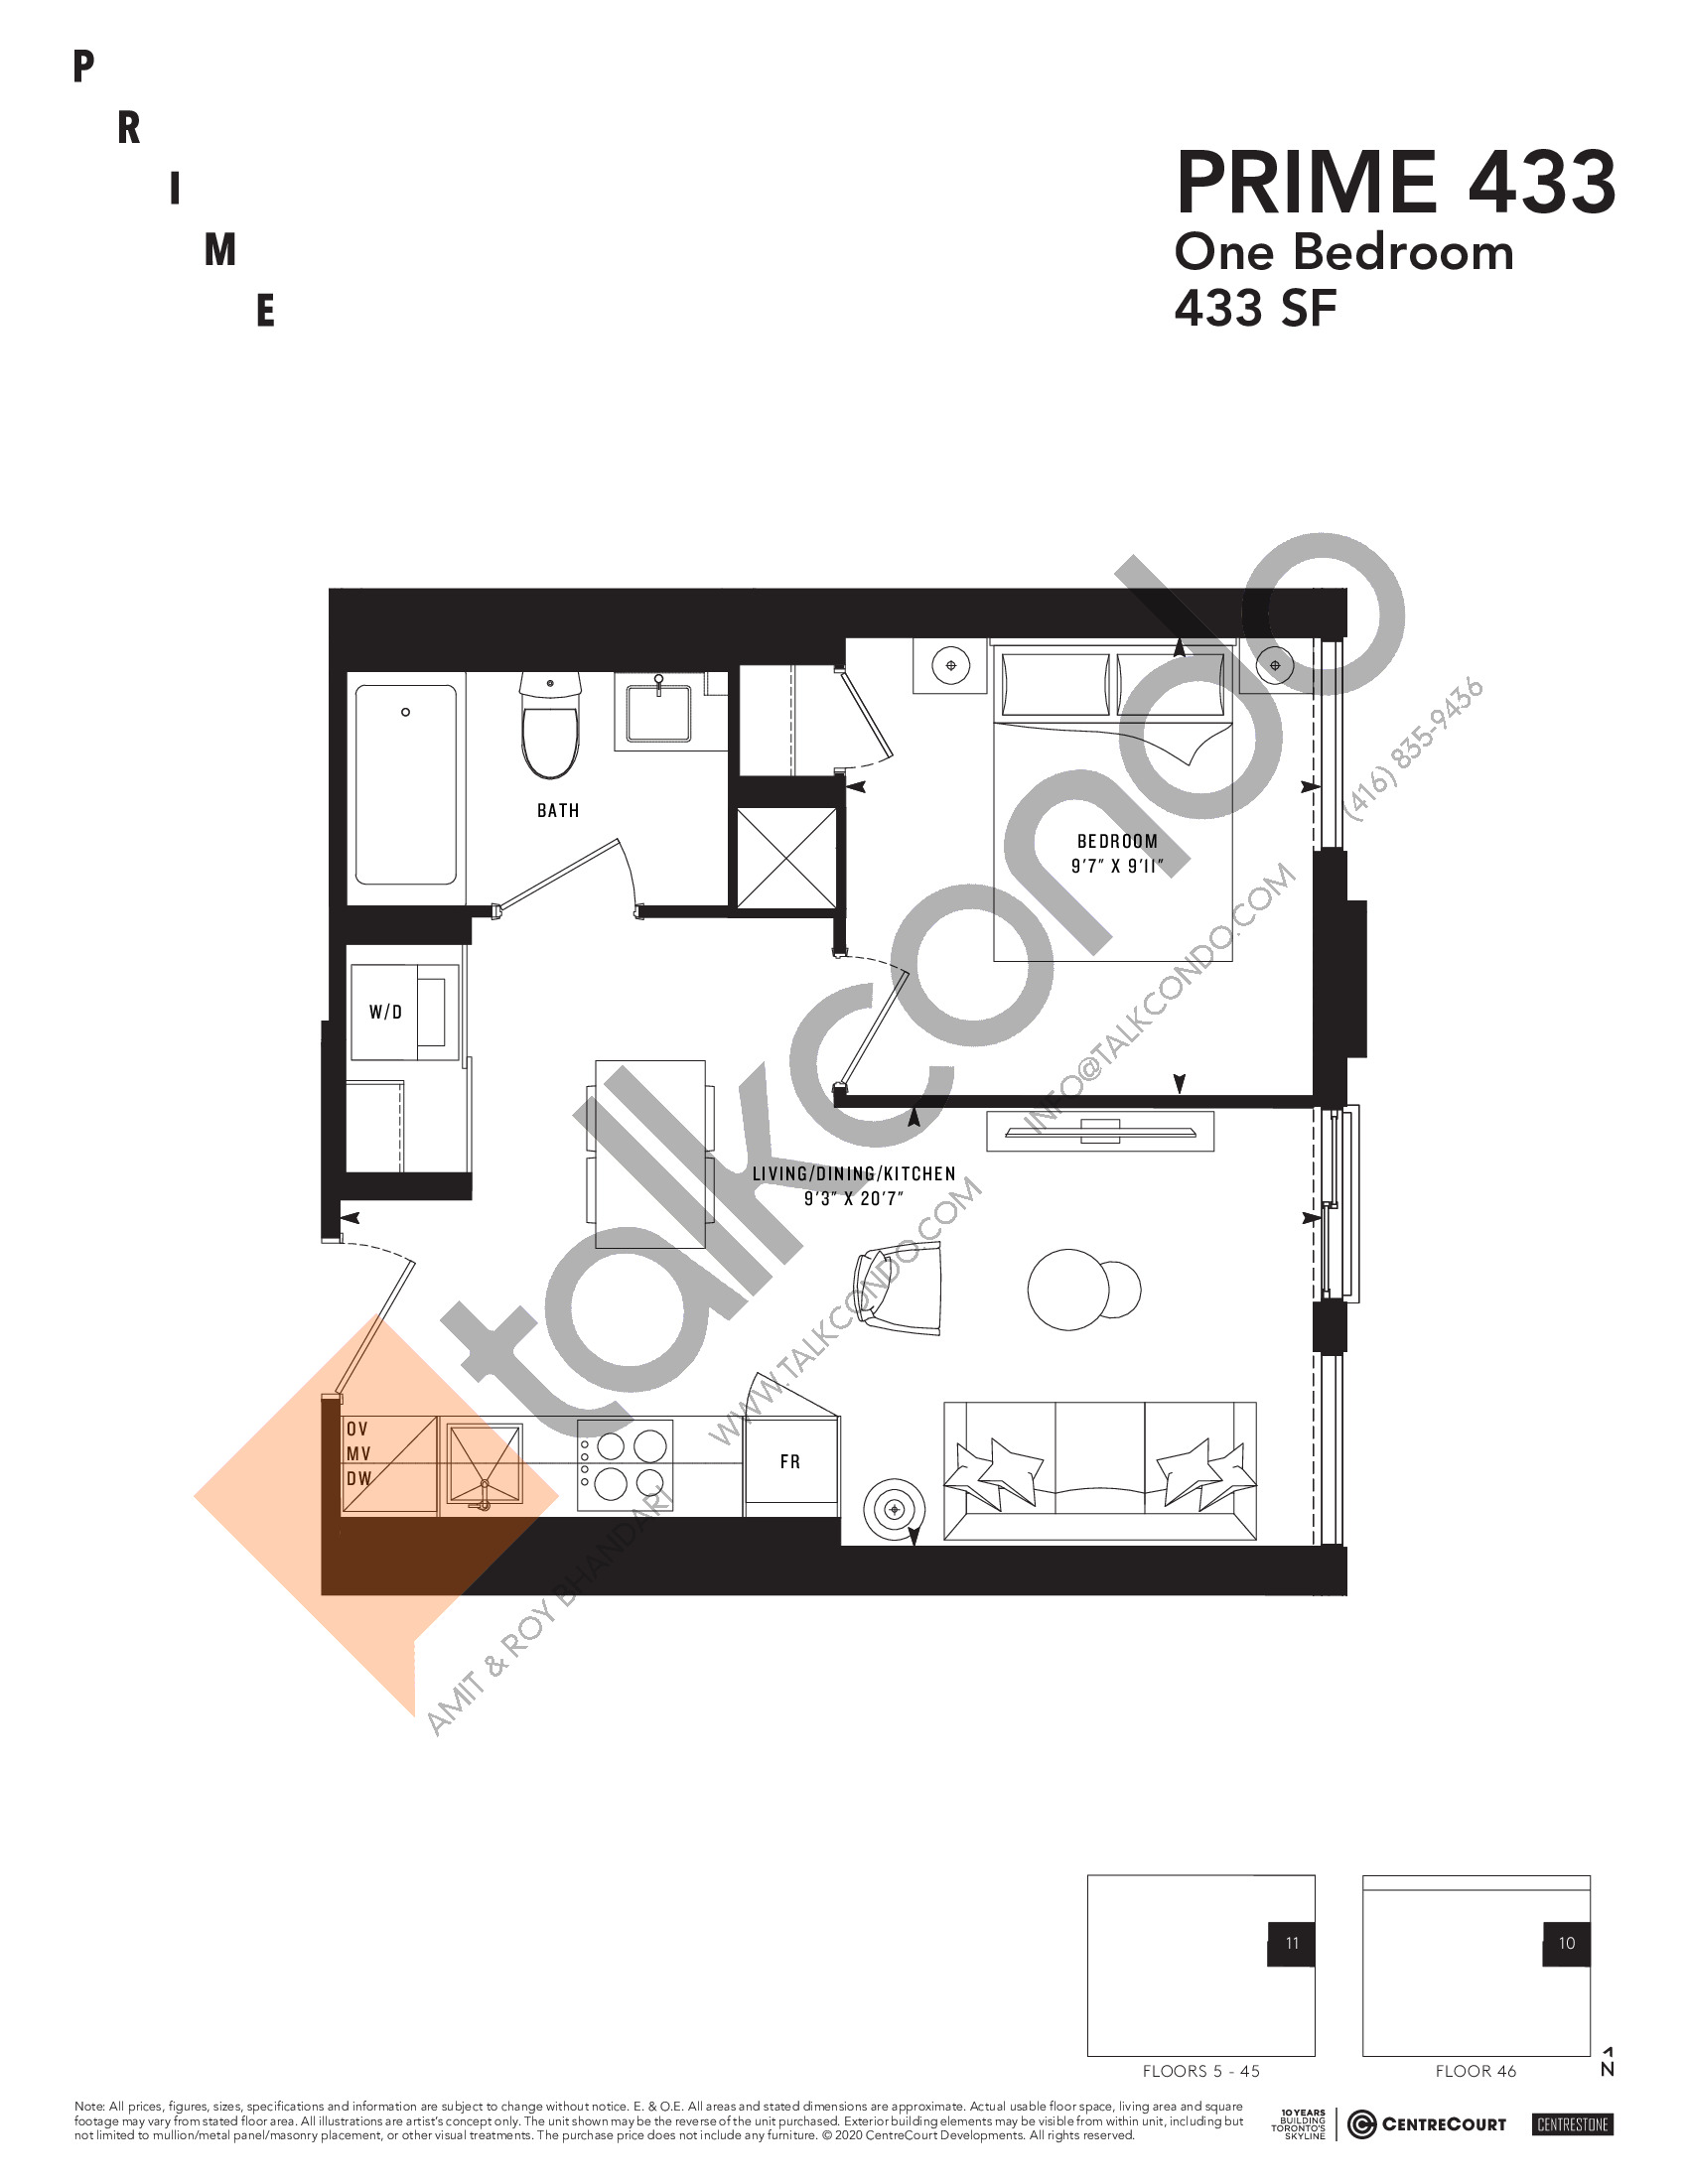 PRIME 433 Floor Plan at Prime Condos - 433 sq.ft